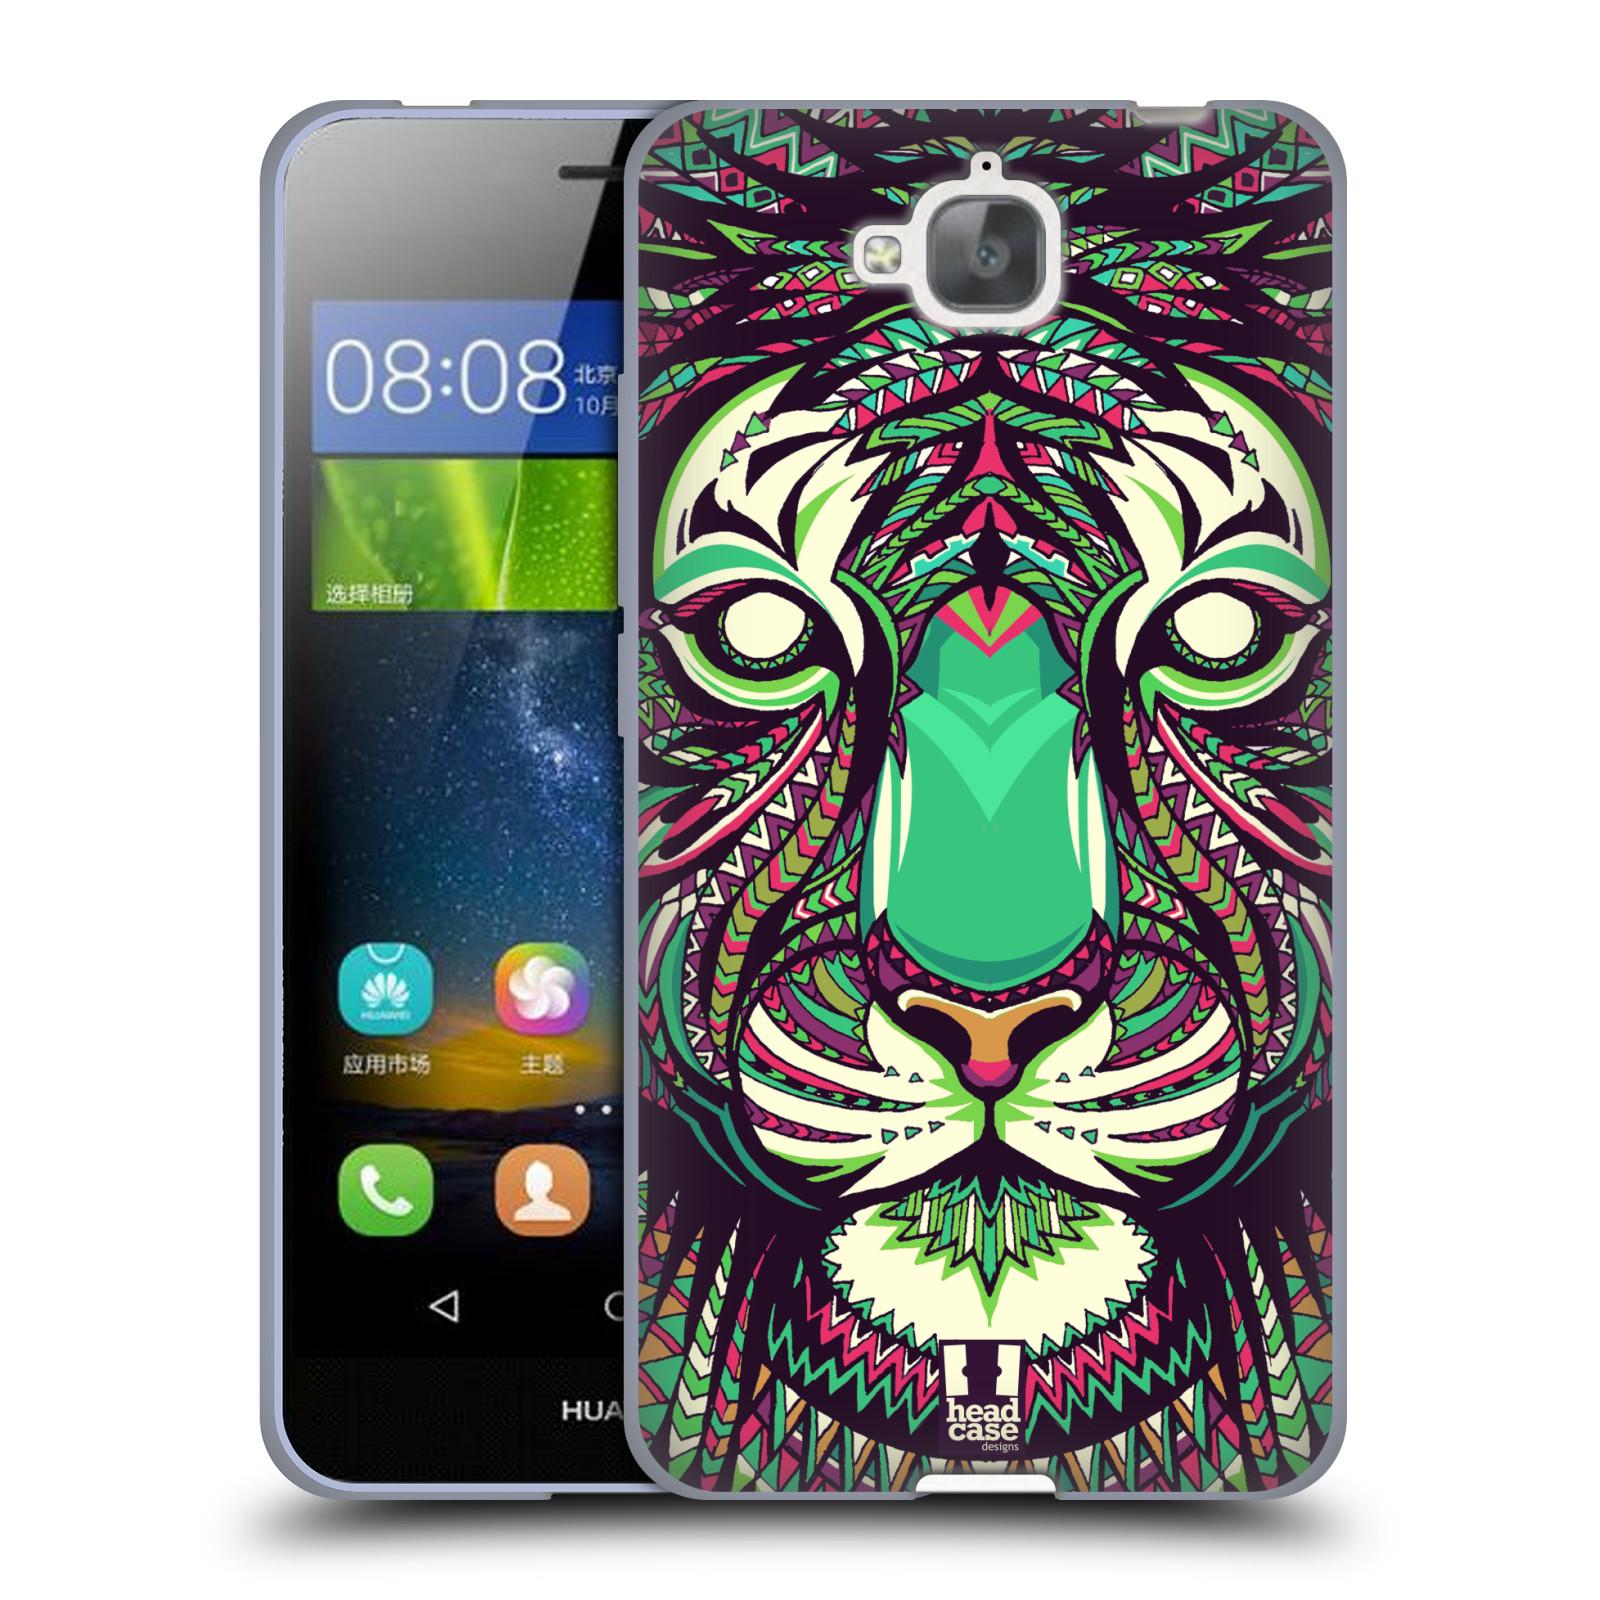 Silikonové pouzdro na mobil Huawei Y6 Pro Dual Sim HEAD CASE AZTEC TYGR